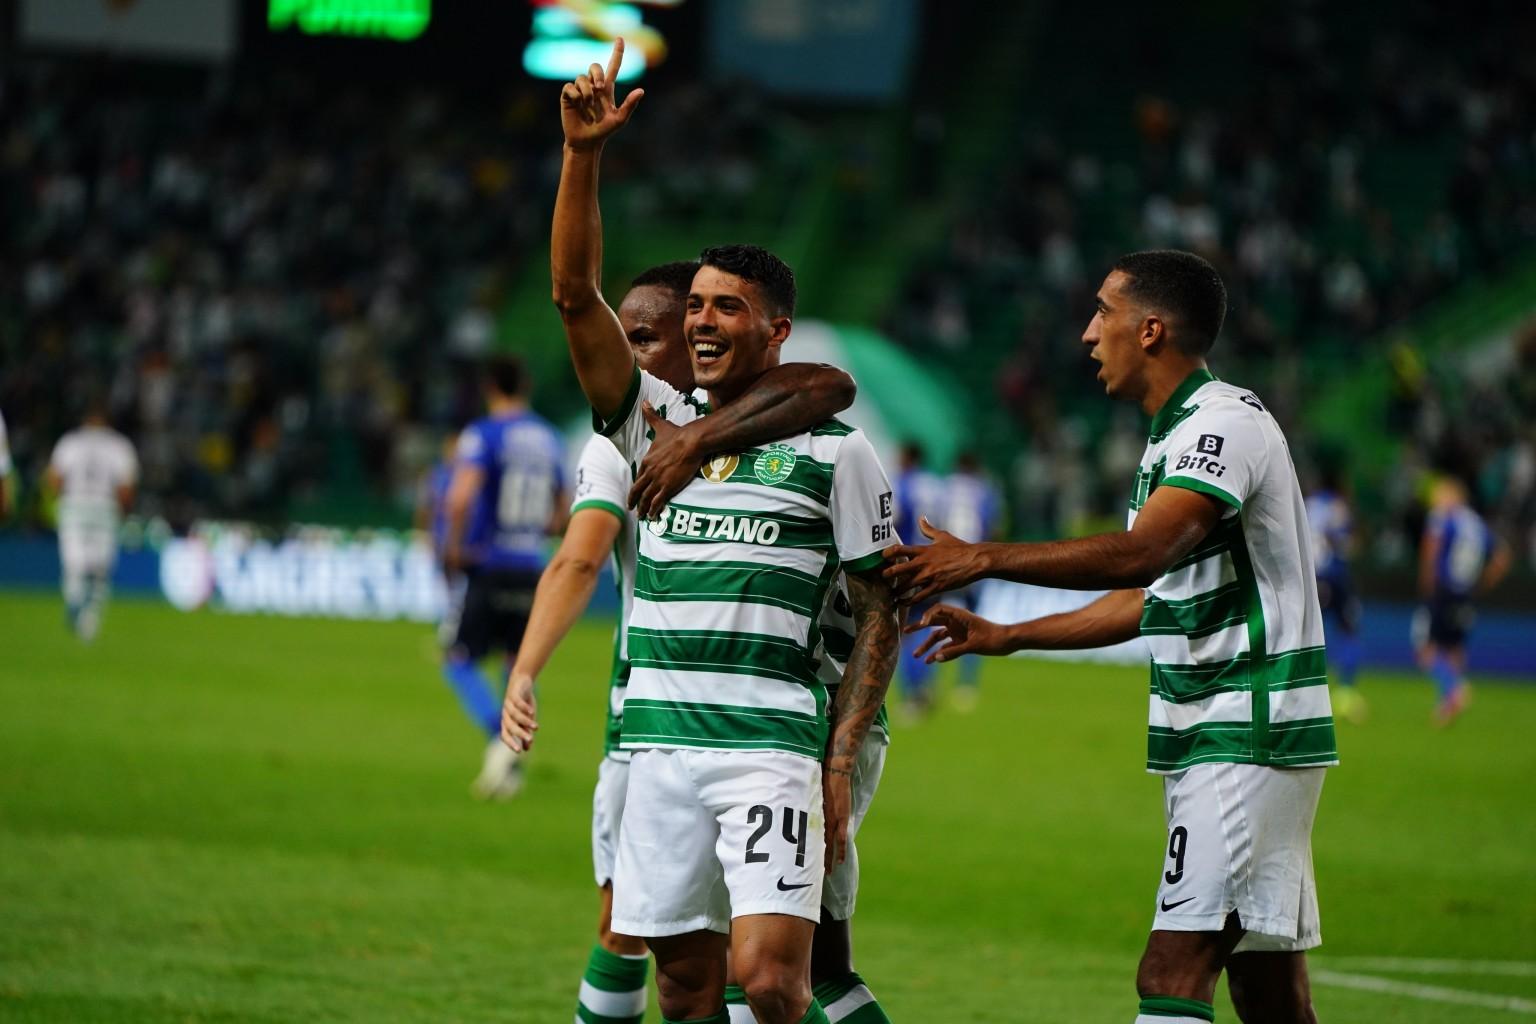 Sporting CP derrotó a Vitória Guimarães